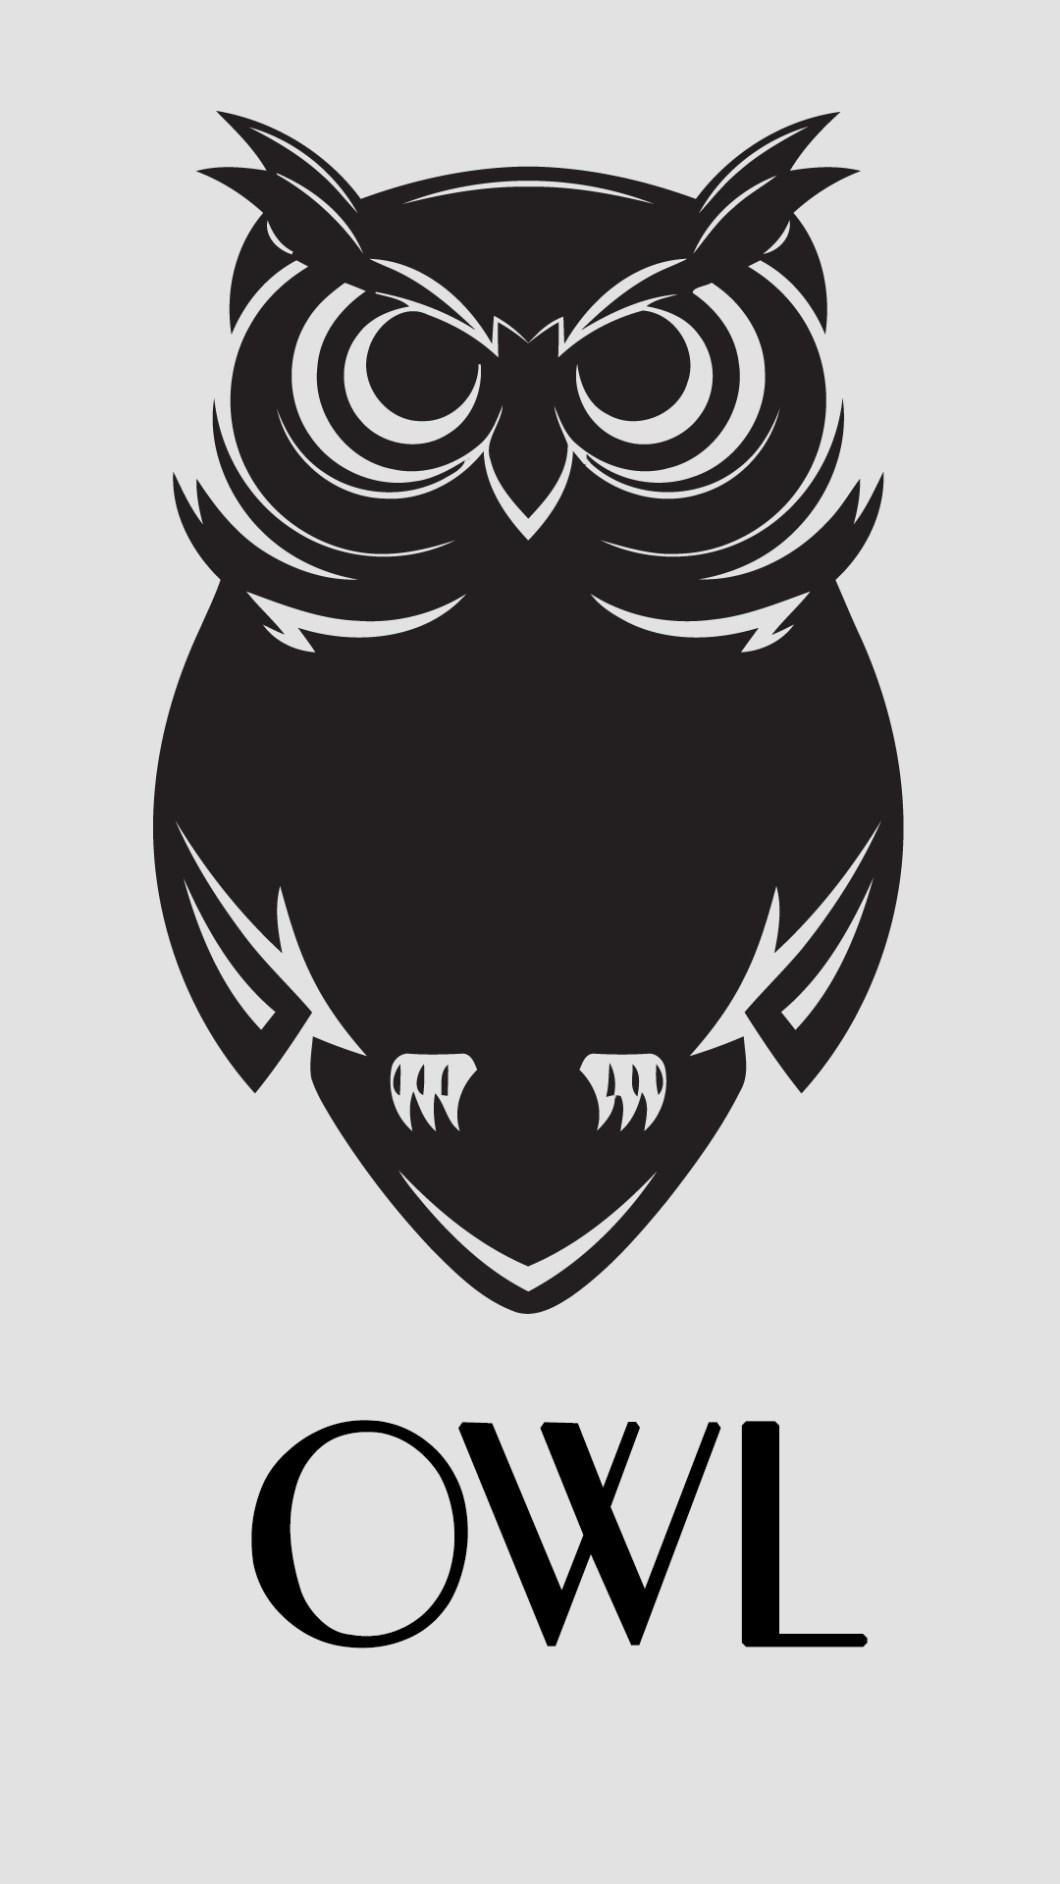 Owl wallpaper hd iphone wallpapergenk free cute owl wallpaper for android pixelstalk net voltagebd Gallery